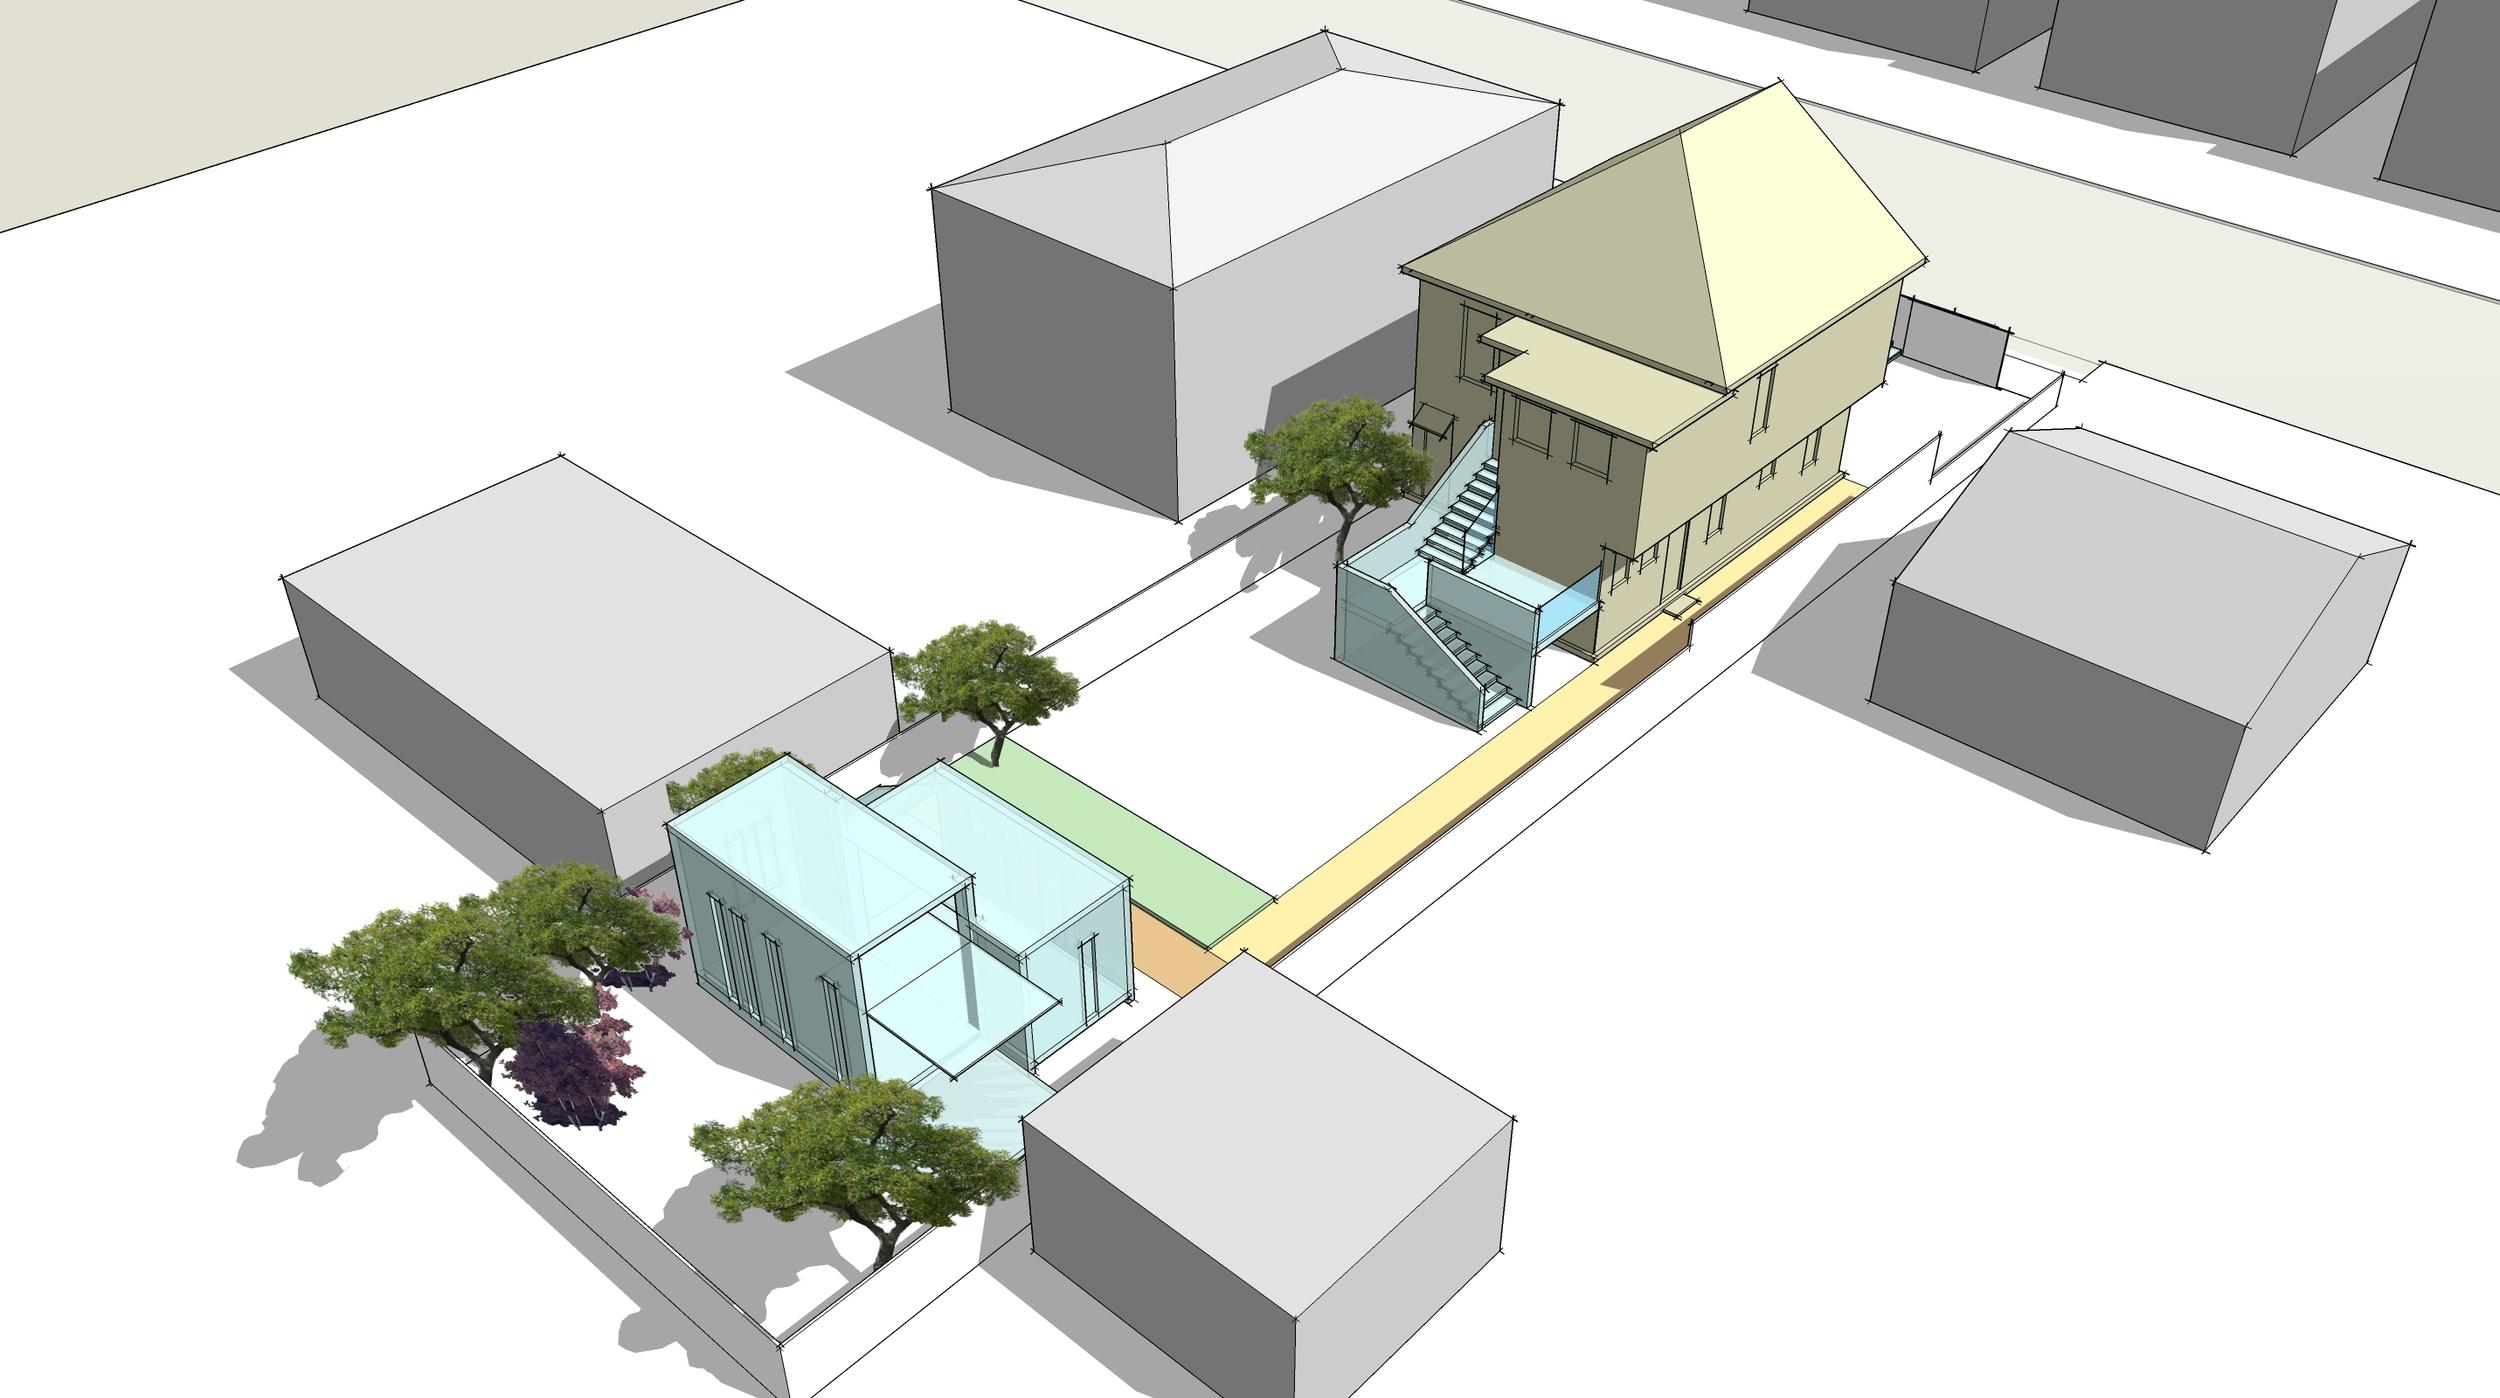 8TH STREET RENOVATION / ADDITION, BERKELEY